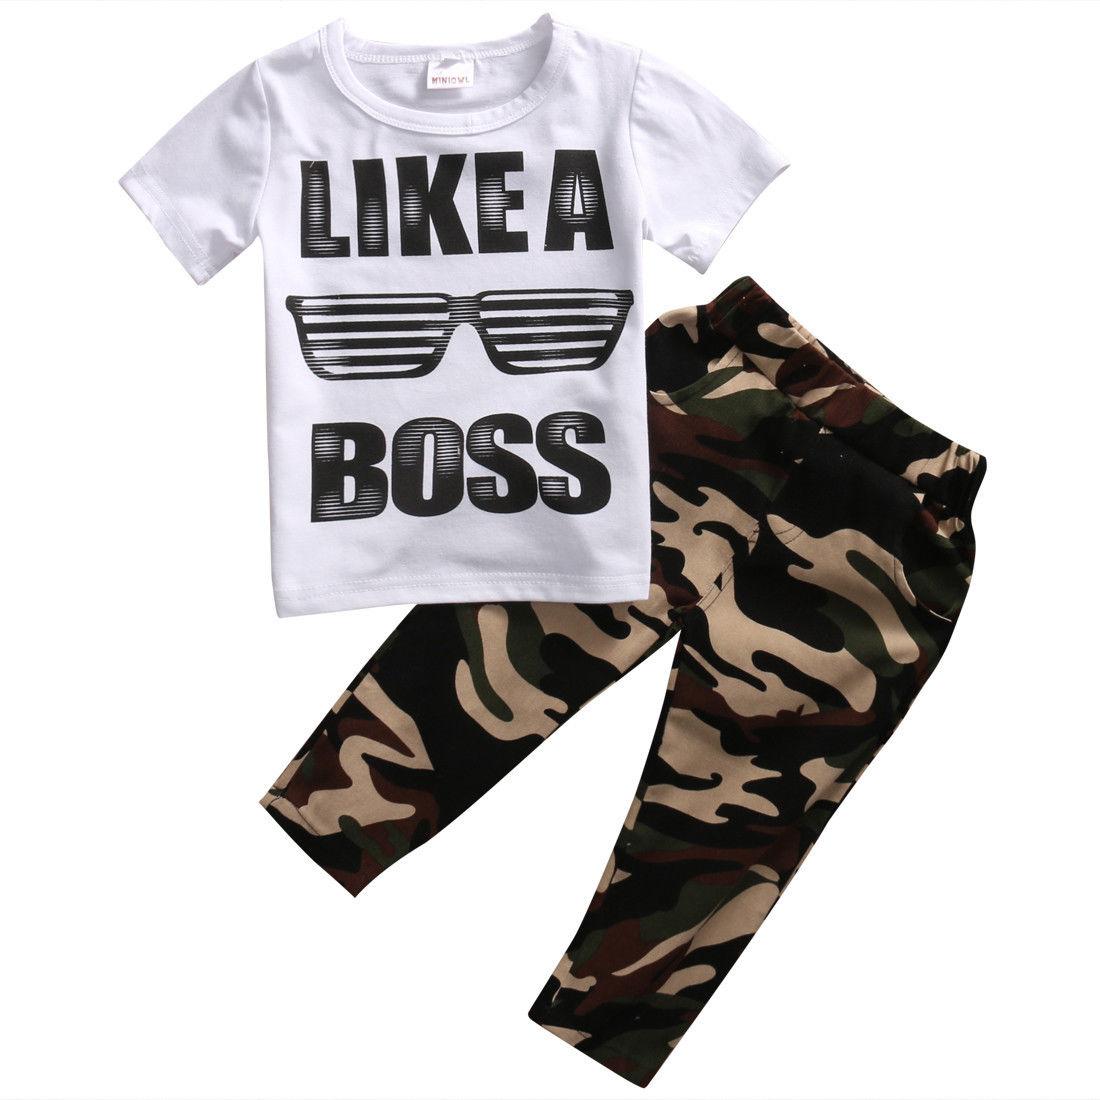 New Toddler Kids Baby Boys Tops T-shirt Camo Short Pants 2Pcs Outfits Set Clothe